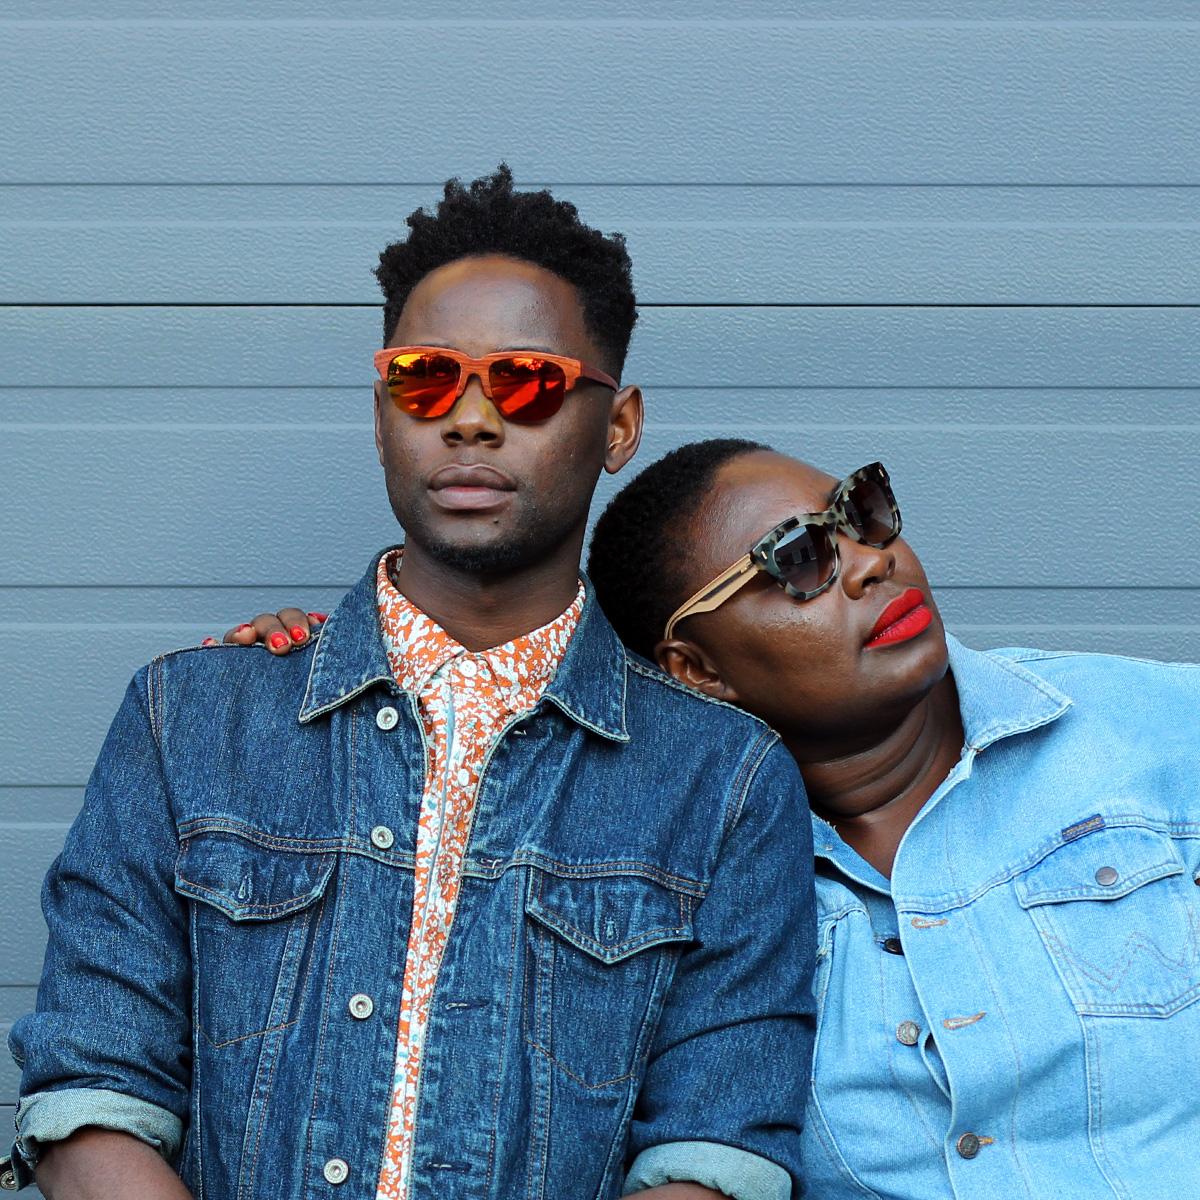 sunglass street style, sunnies, smartbuy sunglasses, fendi sunglasses 00